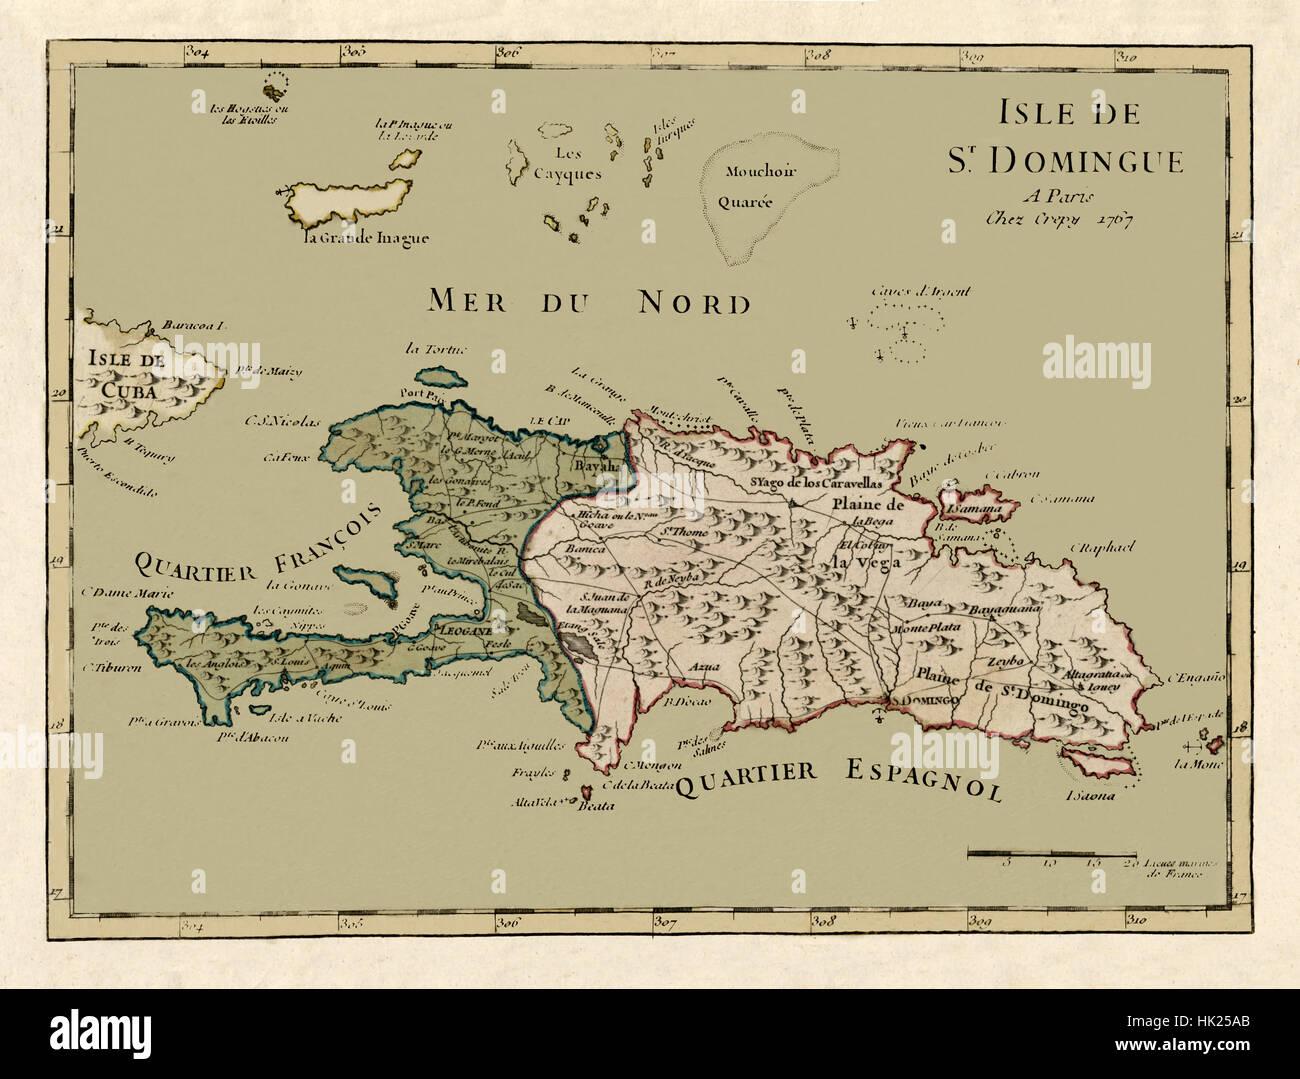 "18/"" x 24/"" 1767 Map of Isle de St Domingue Hispaniola"